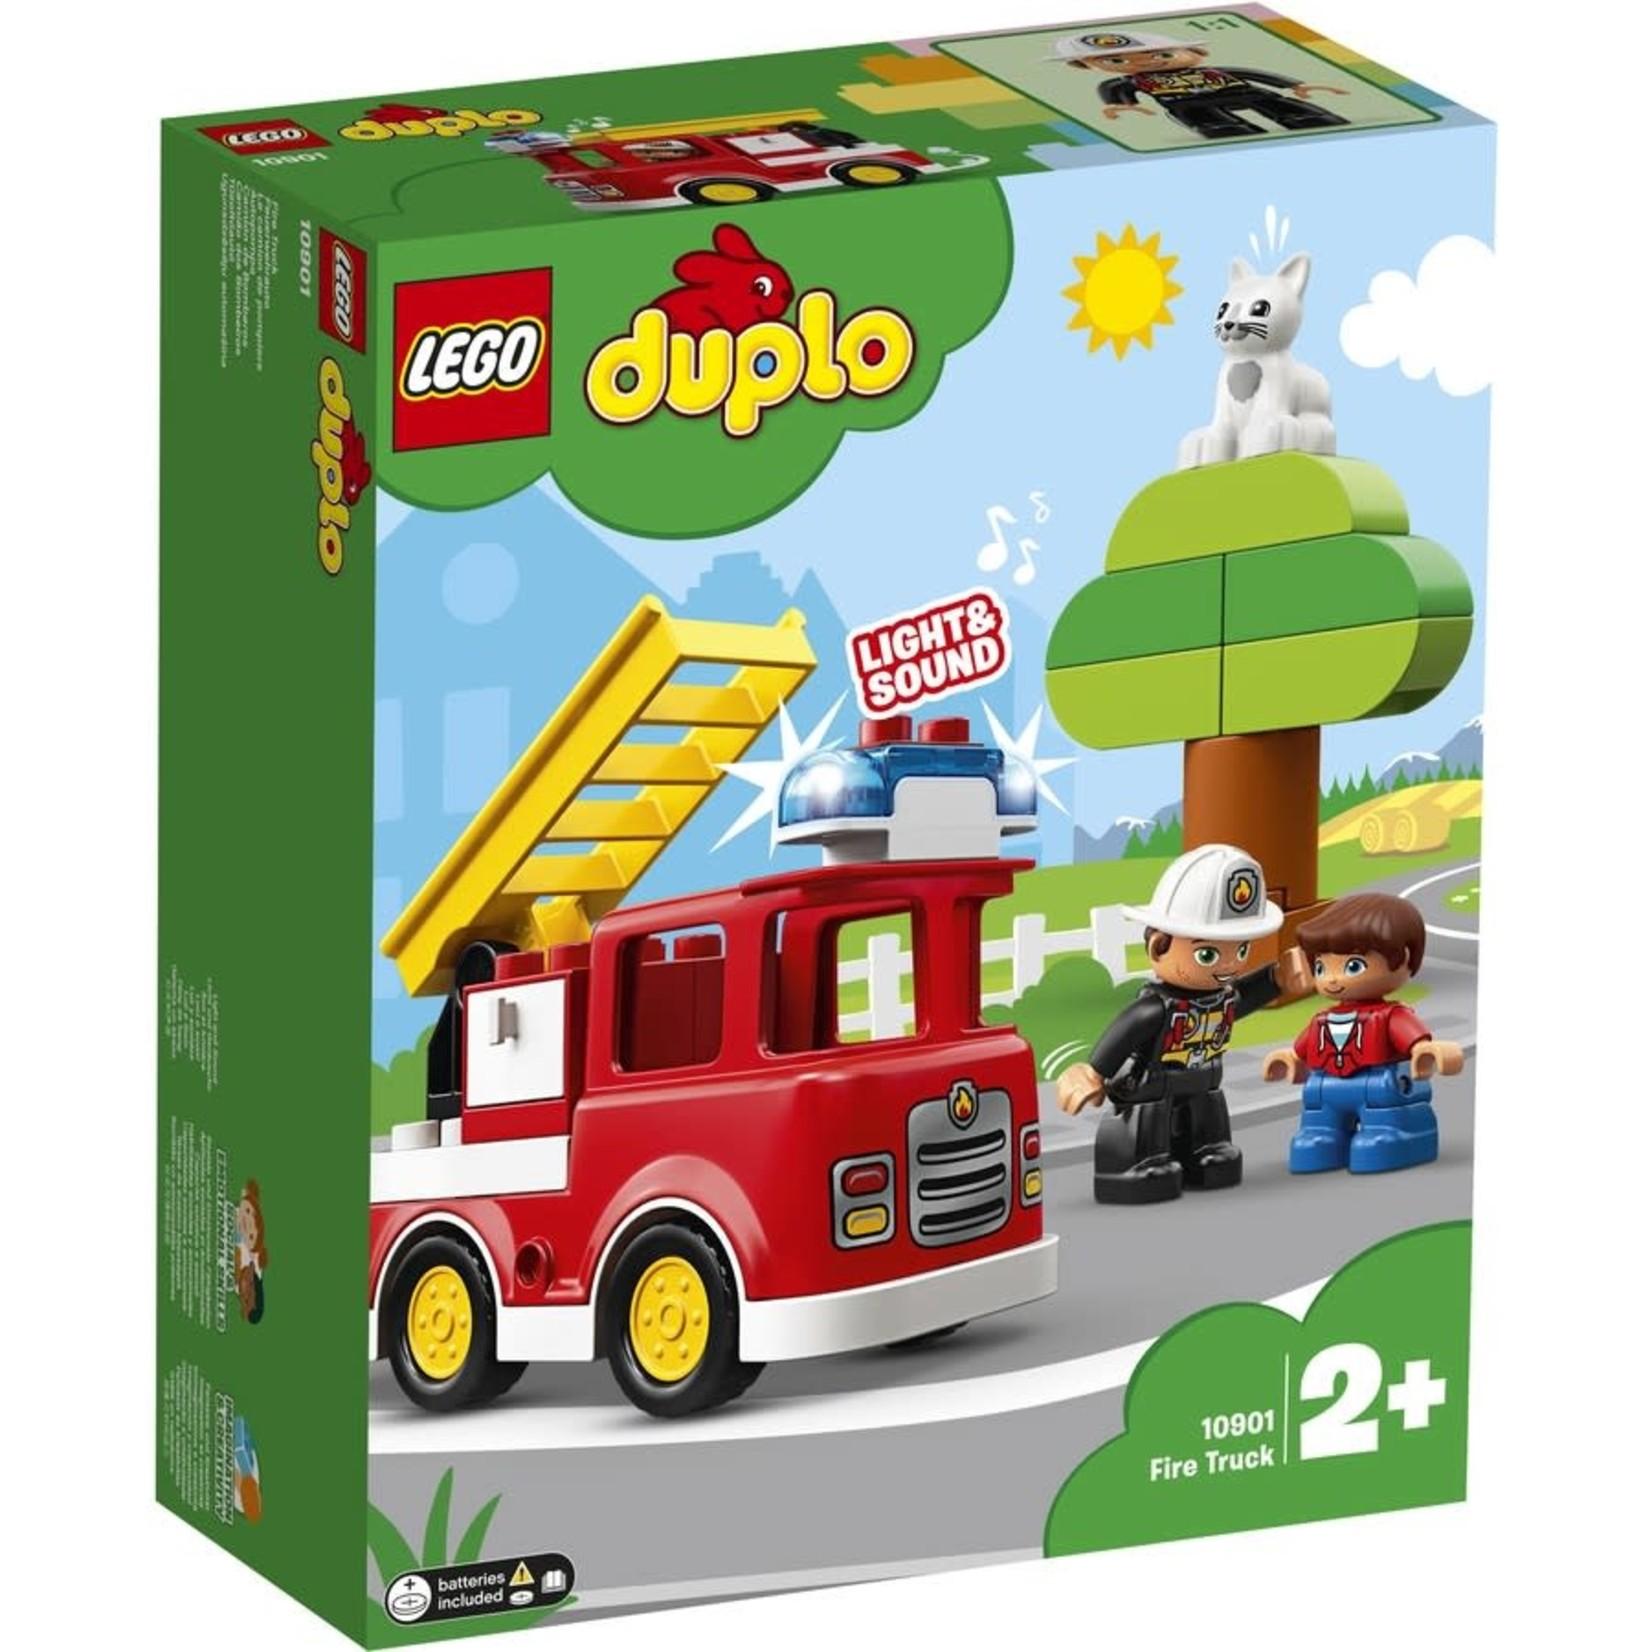 LEGO Lego Duplo Fire Truck 21p (10901)